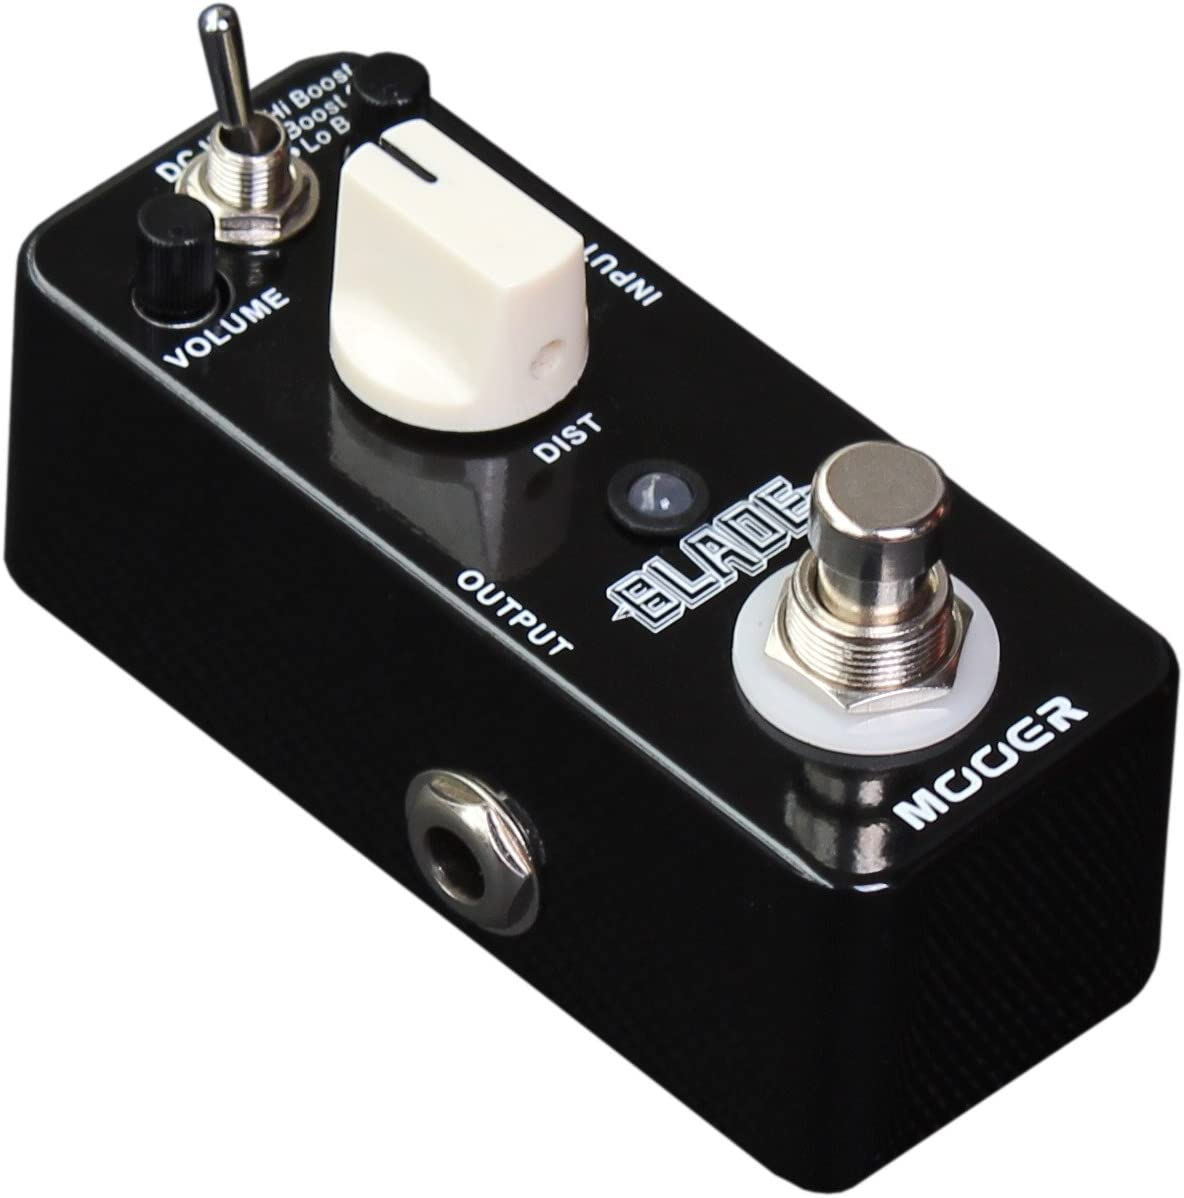 Mooer Blade metal distortion micro pedal